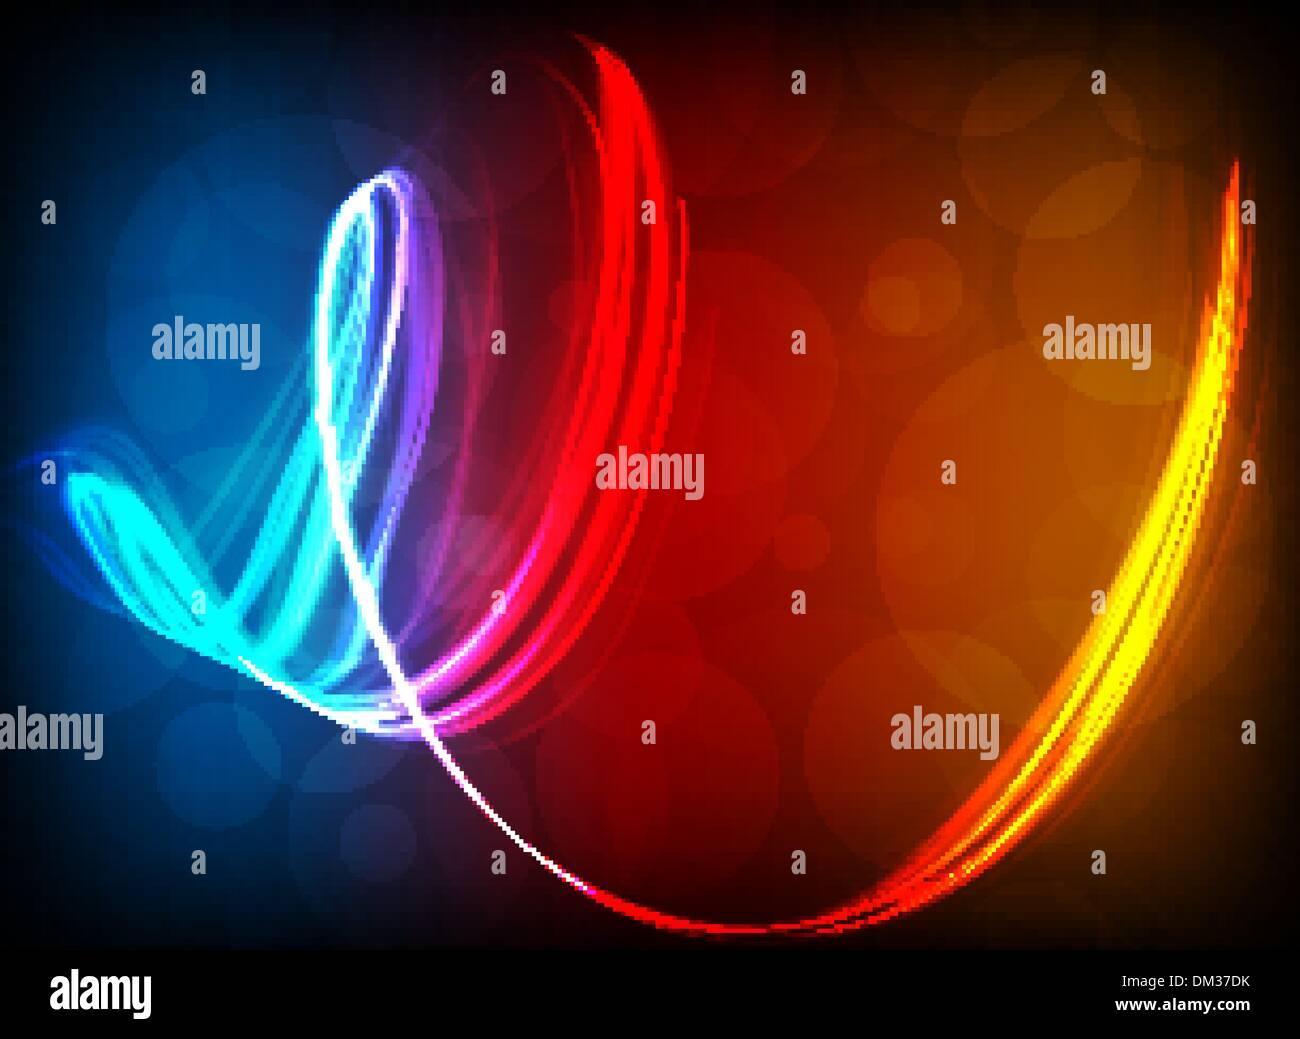 Abstract lights. - Stock Image